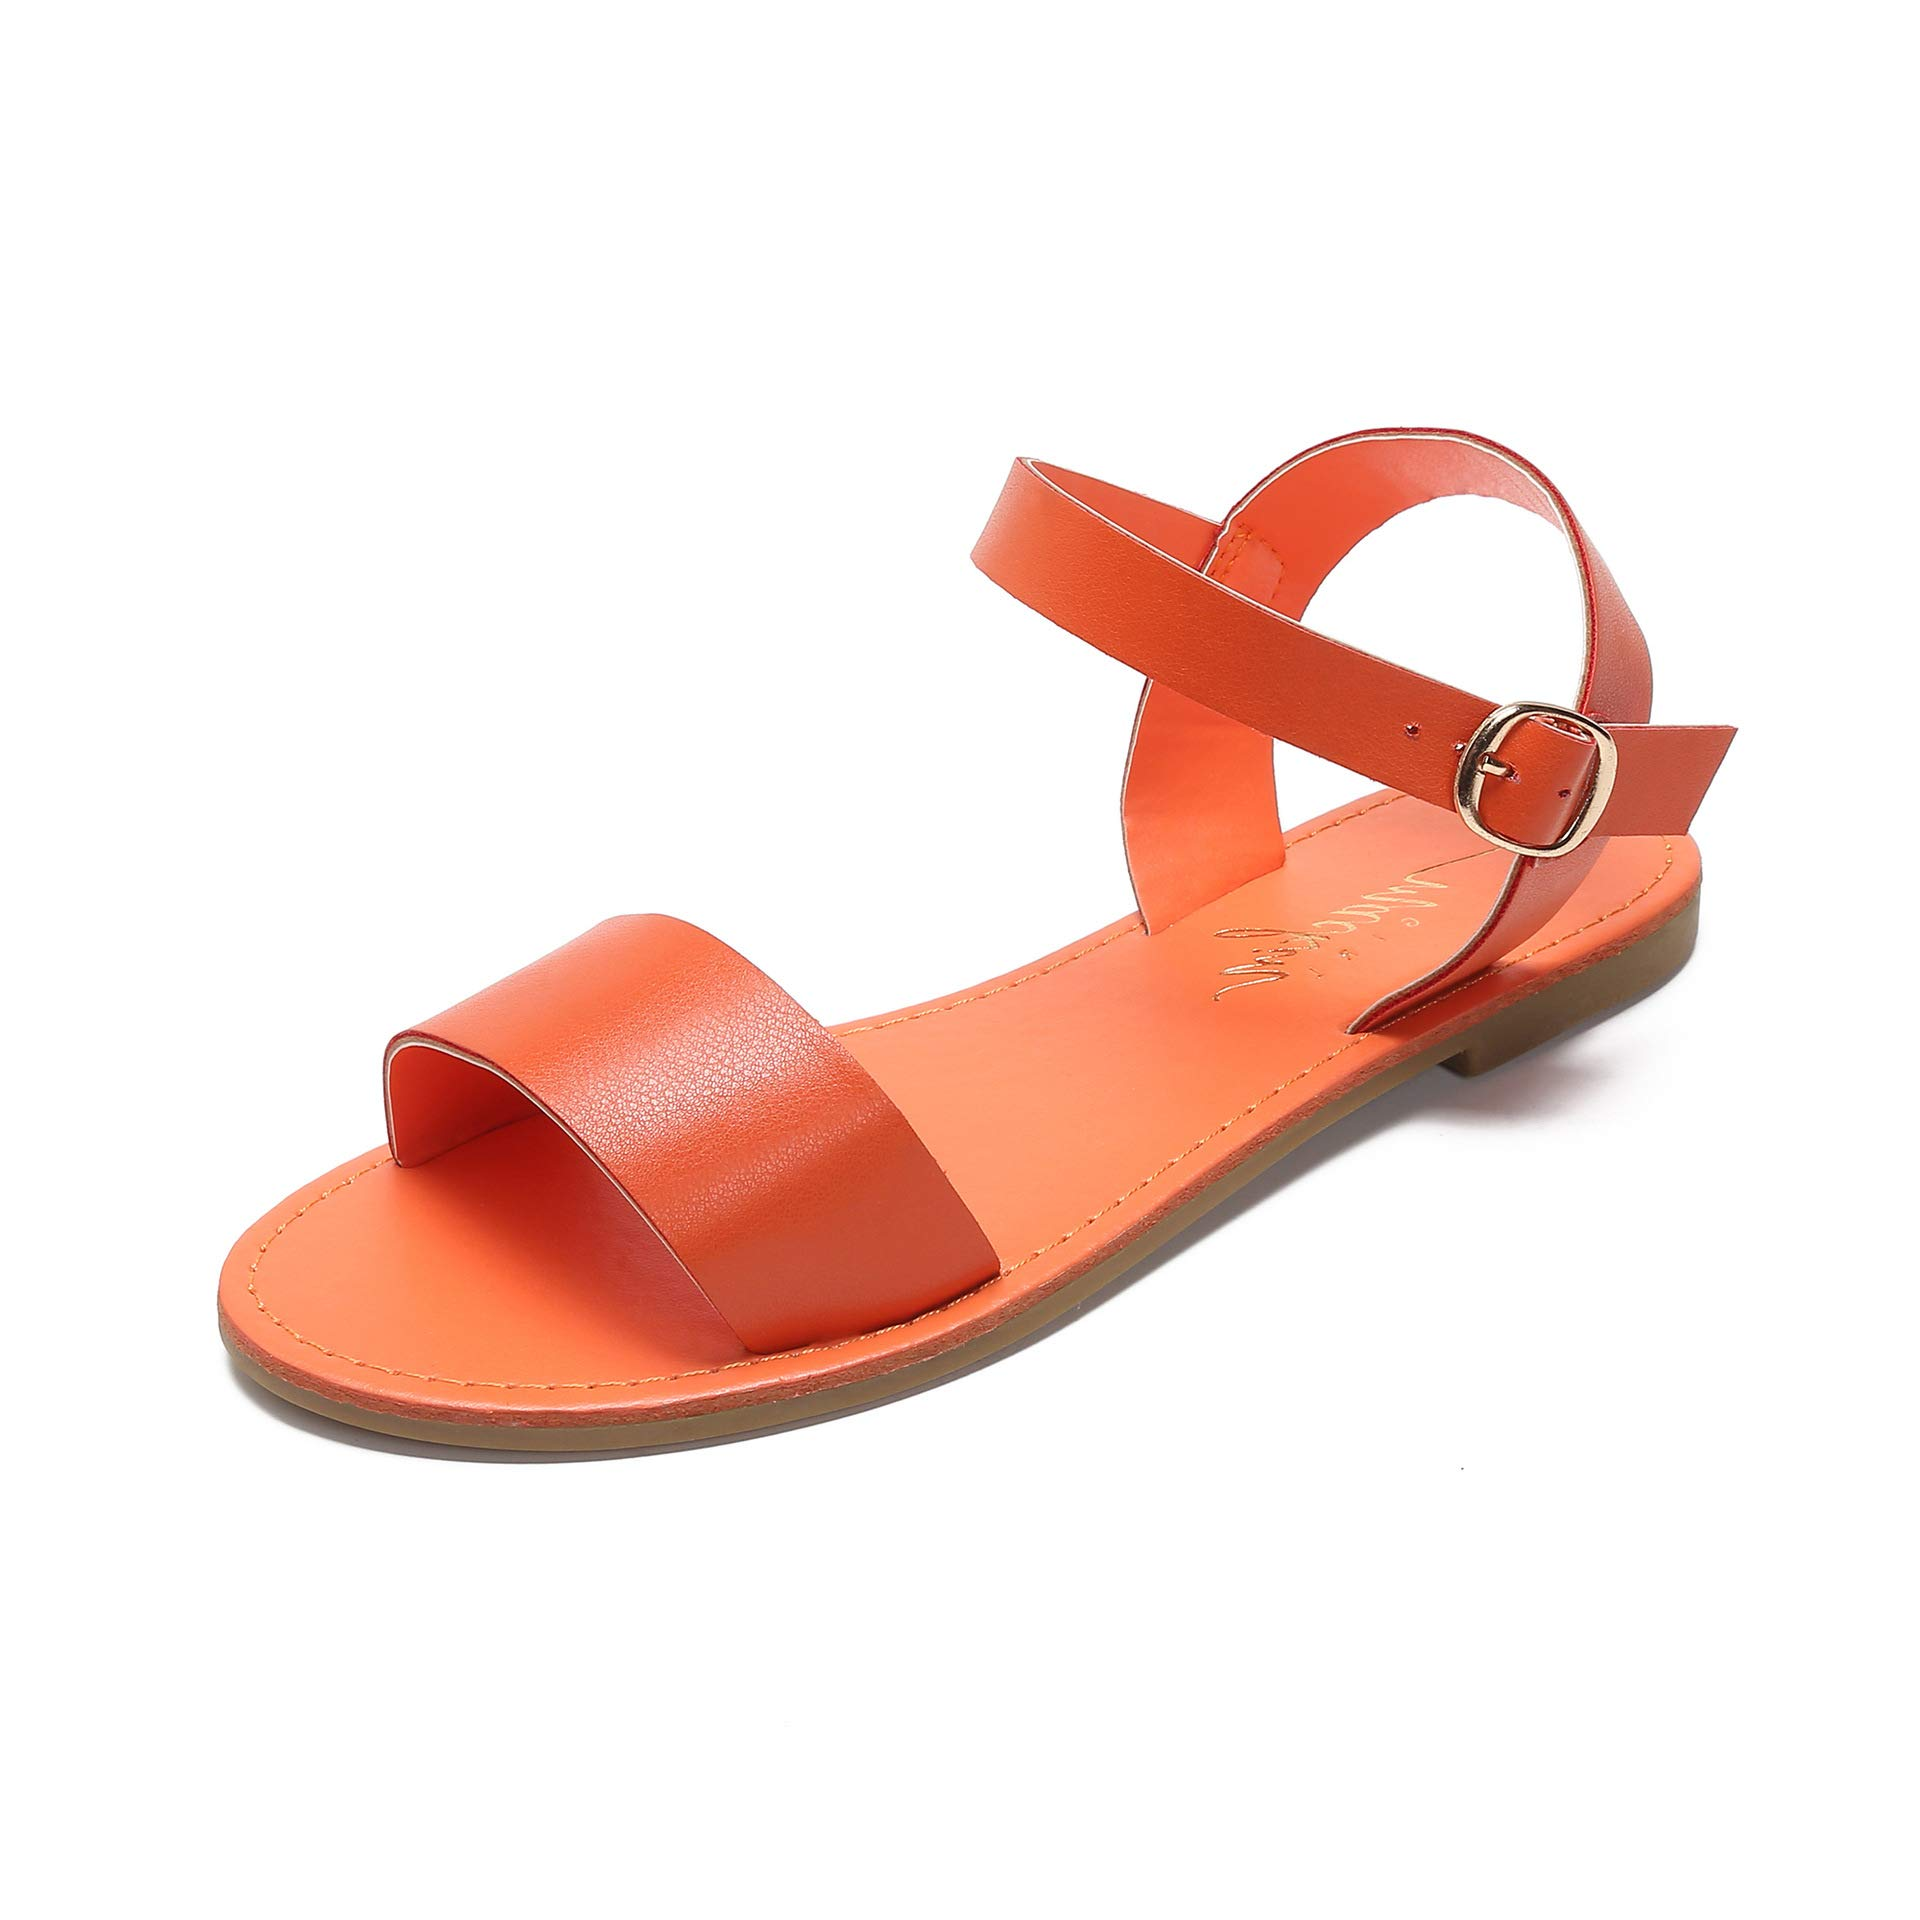 MACKIN J G388-2 Women's Open Toe Flat Sandals One Band Ankle Strap Summer Sandals